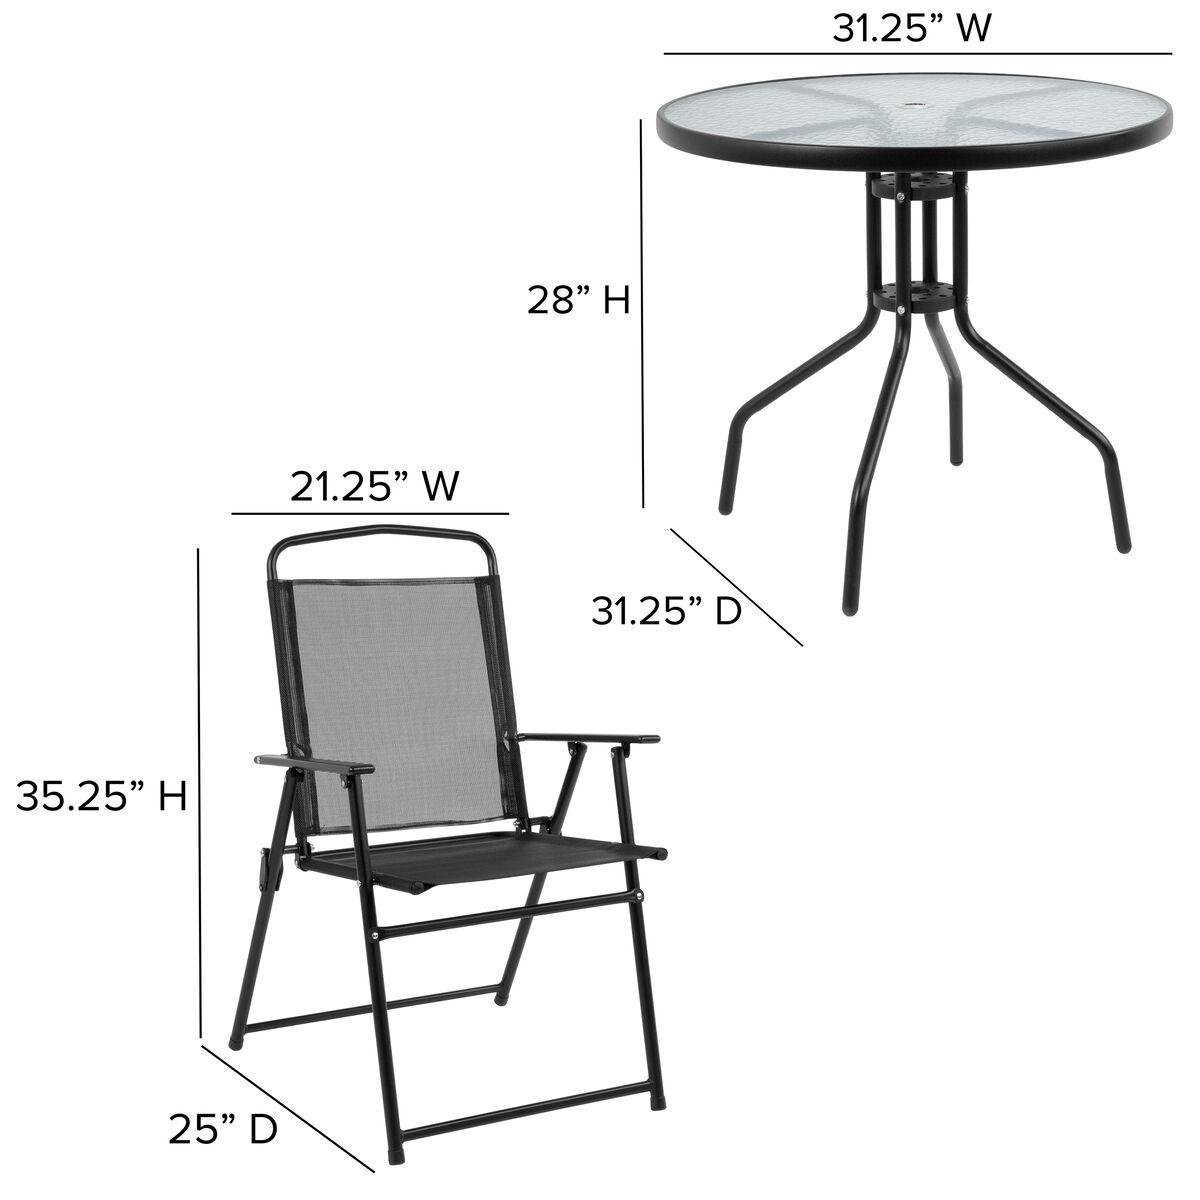 Astonishing Nantucket 6 Piece Black Patio Garden Set With Table Umbrella And 4 Folding Chairs Uwap Interior Chair Design Uwaporg